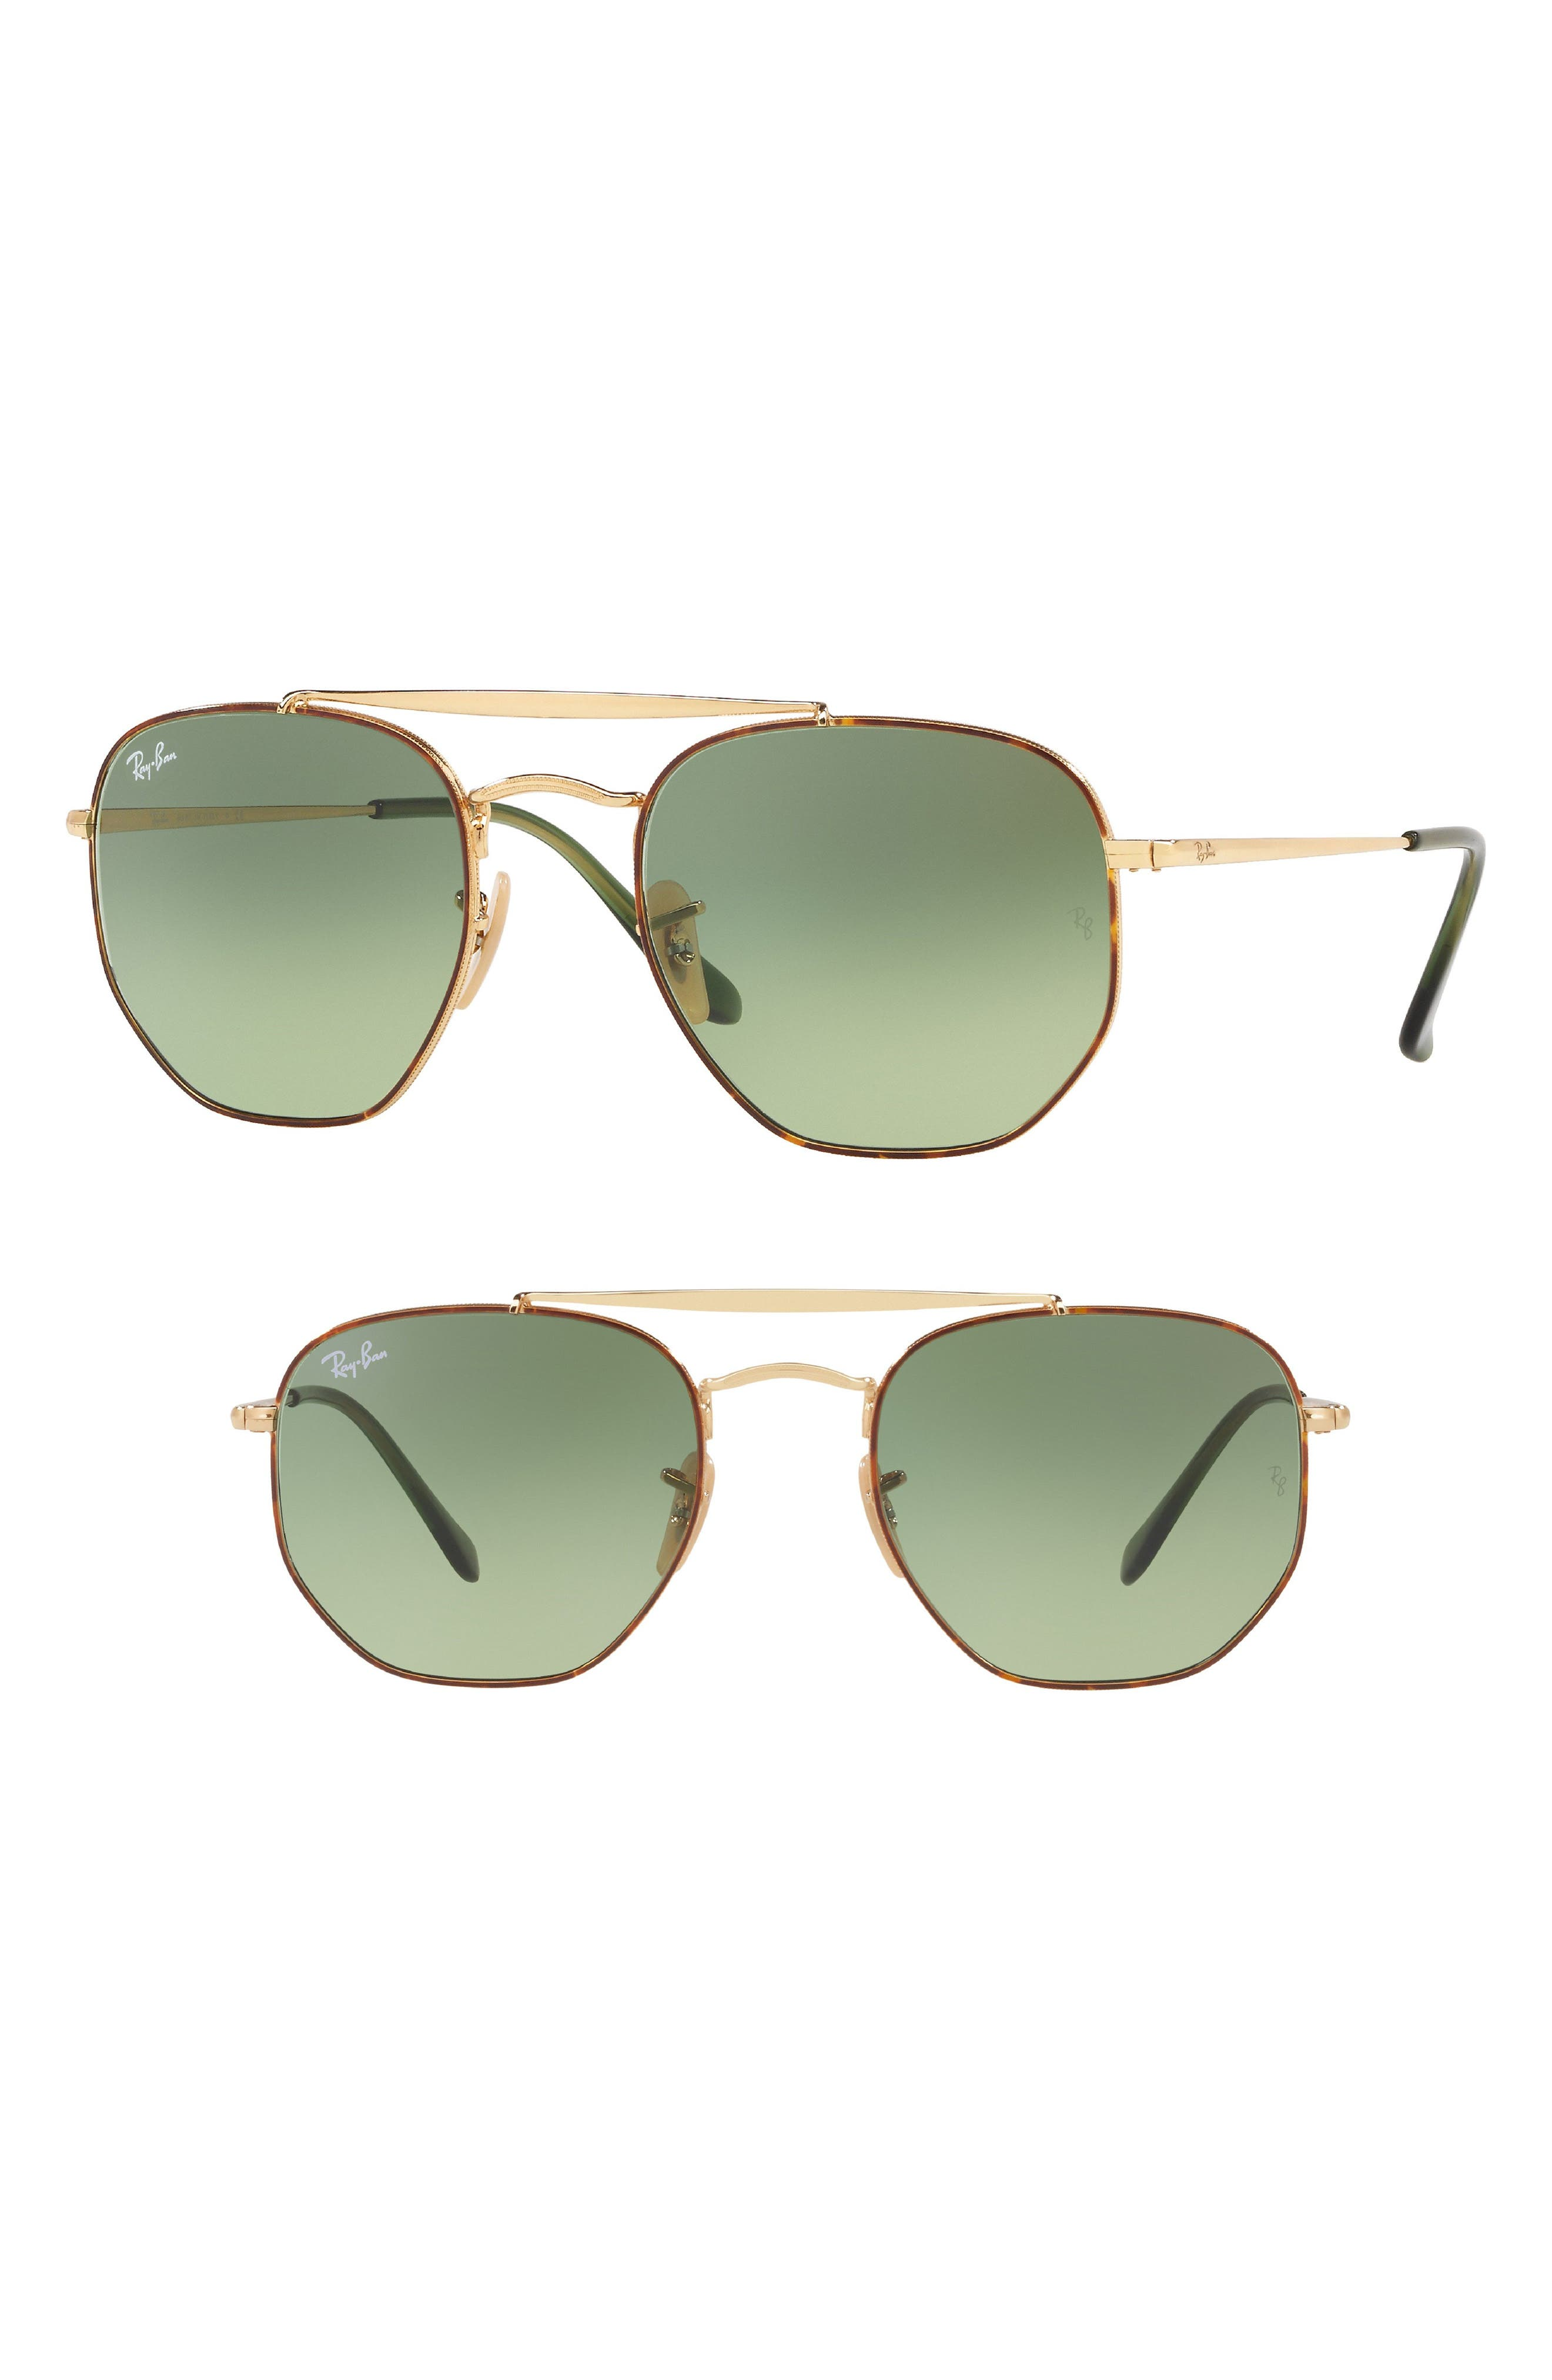 Ray-Ban 5m Gradient Sunglasses -